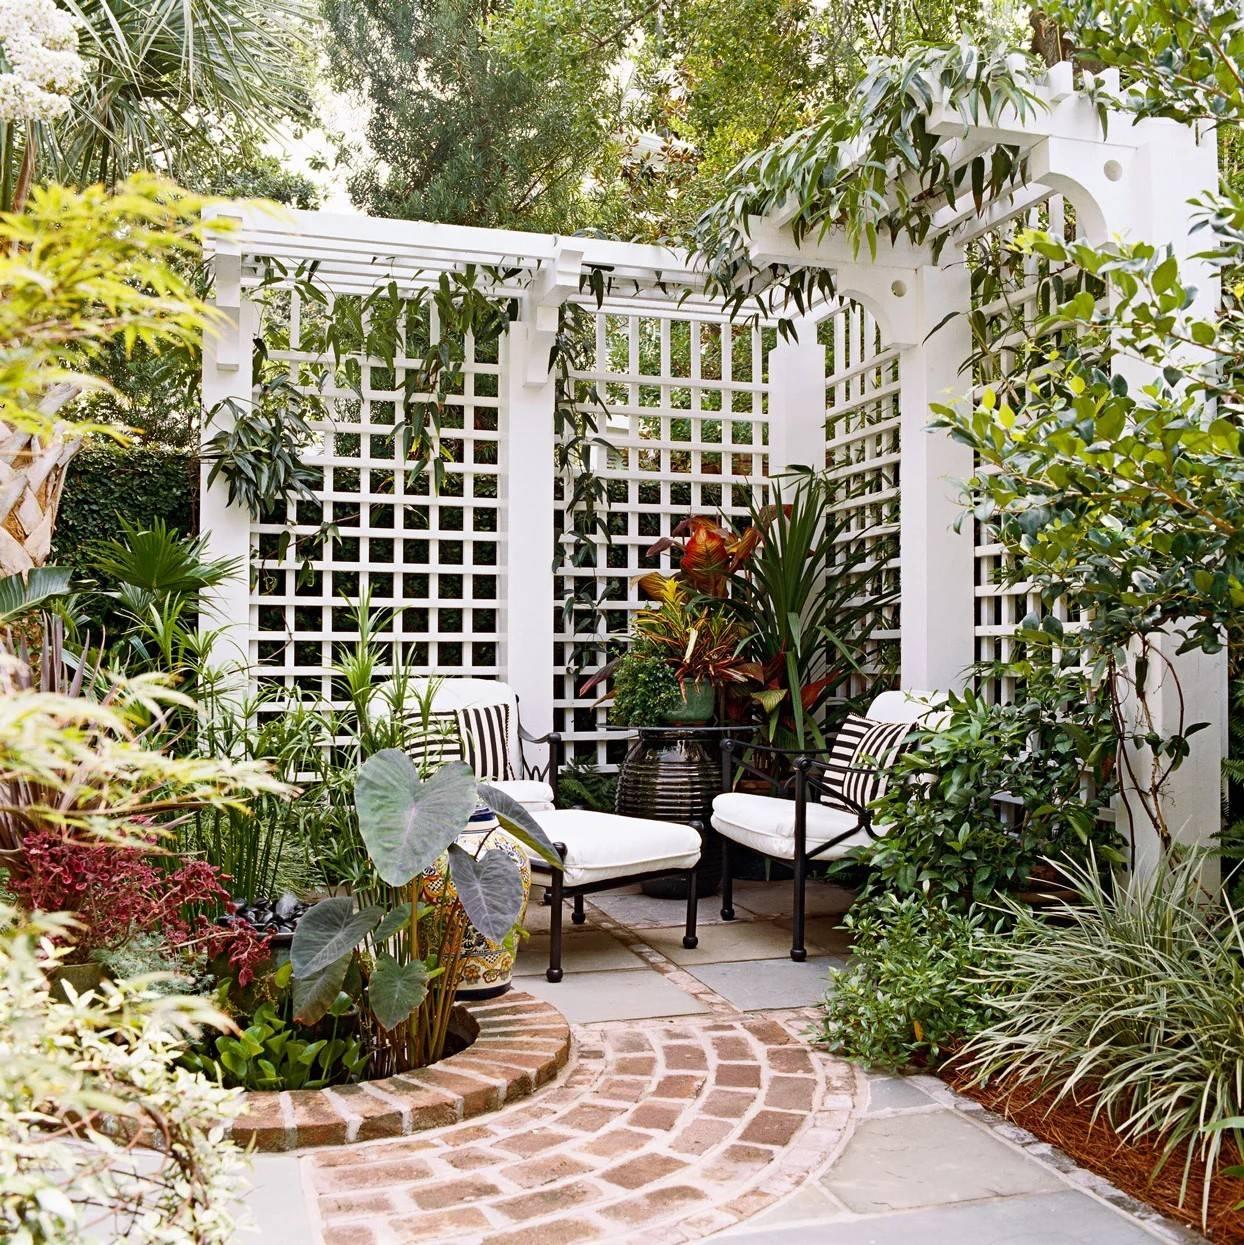 white wooden lattice privacy fence